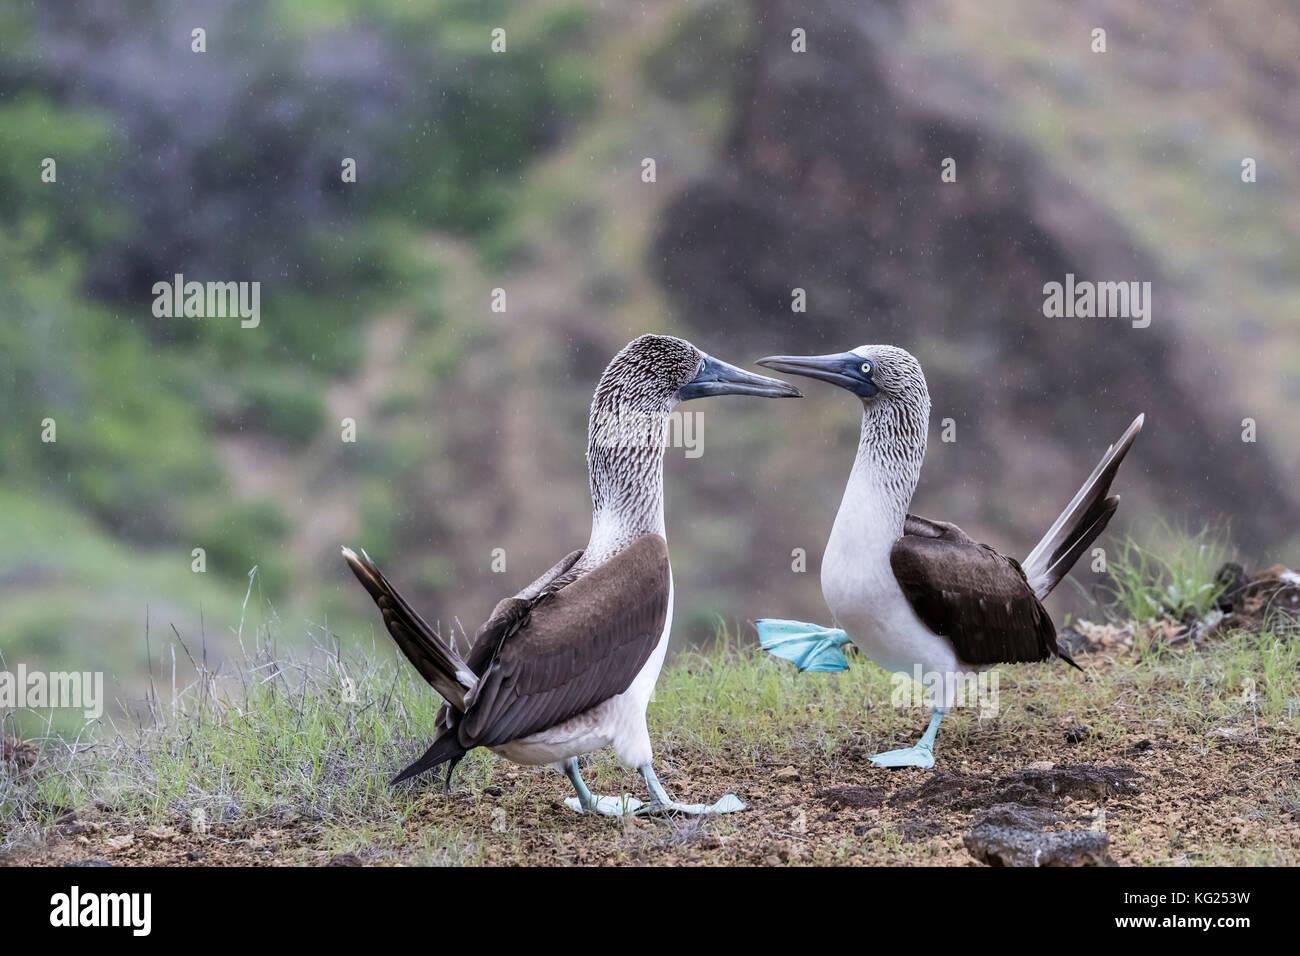 Blue-footed Booby (Sula nebouxii) Paar in der Balz auf der Insel San Cristobal, Galapagos, Ecuador, Südamerika Stockbild